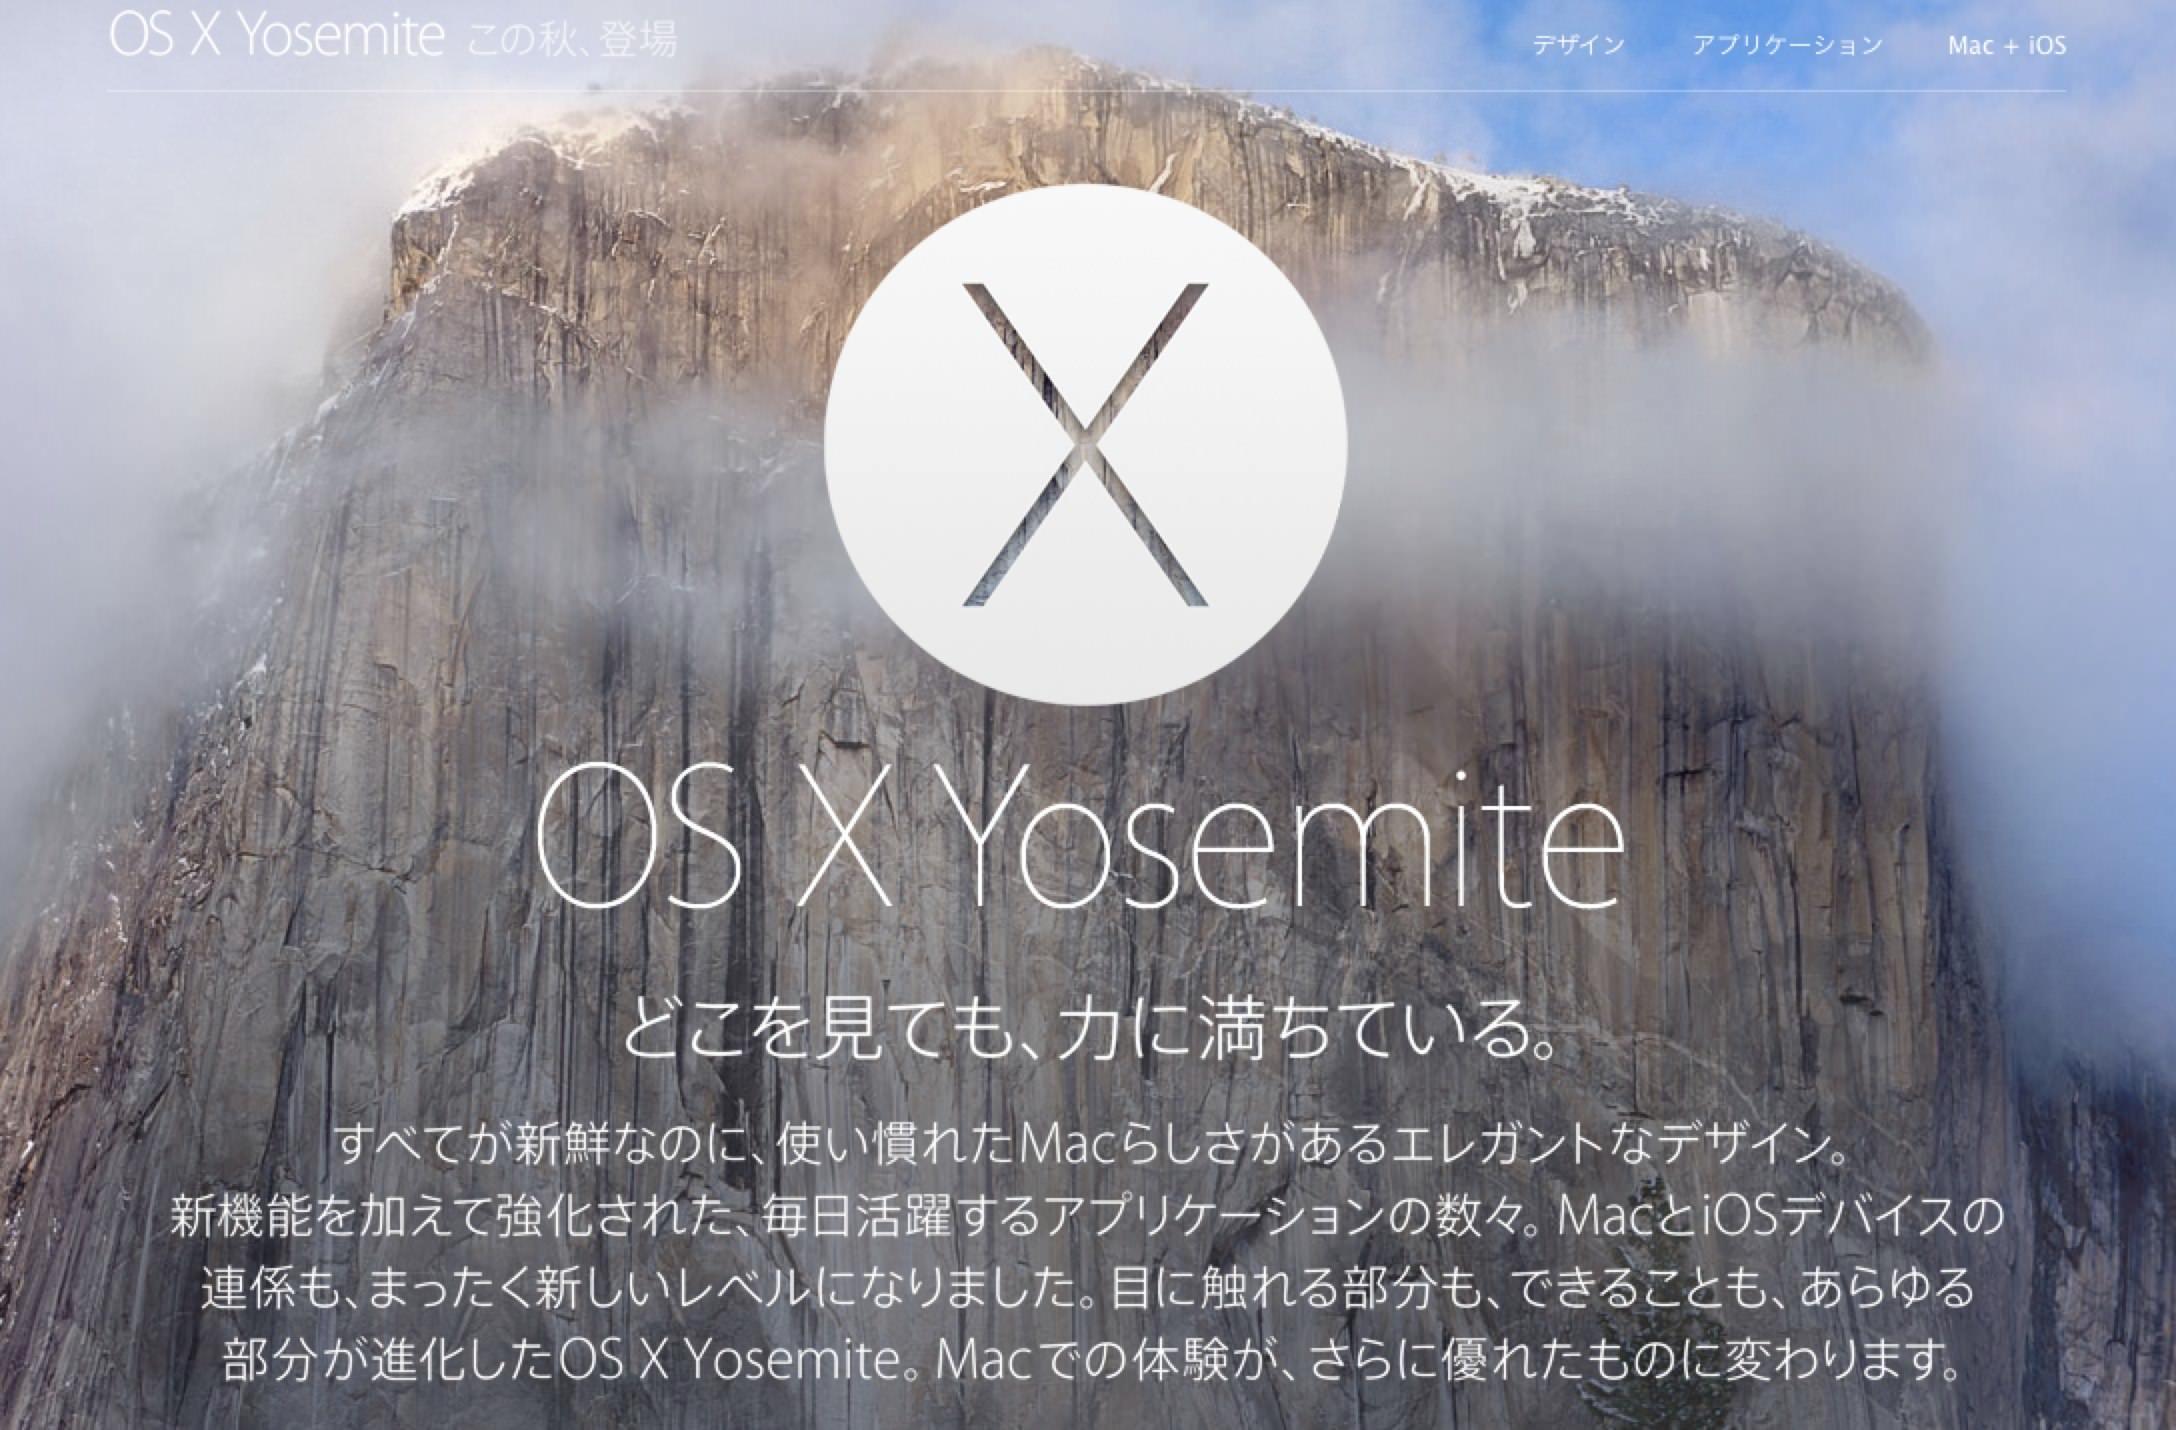 Yosemite 03 10062014 232836